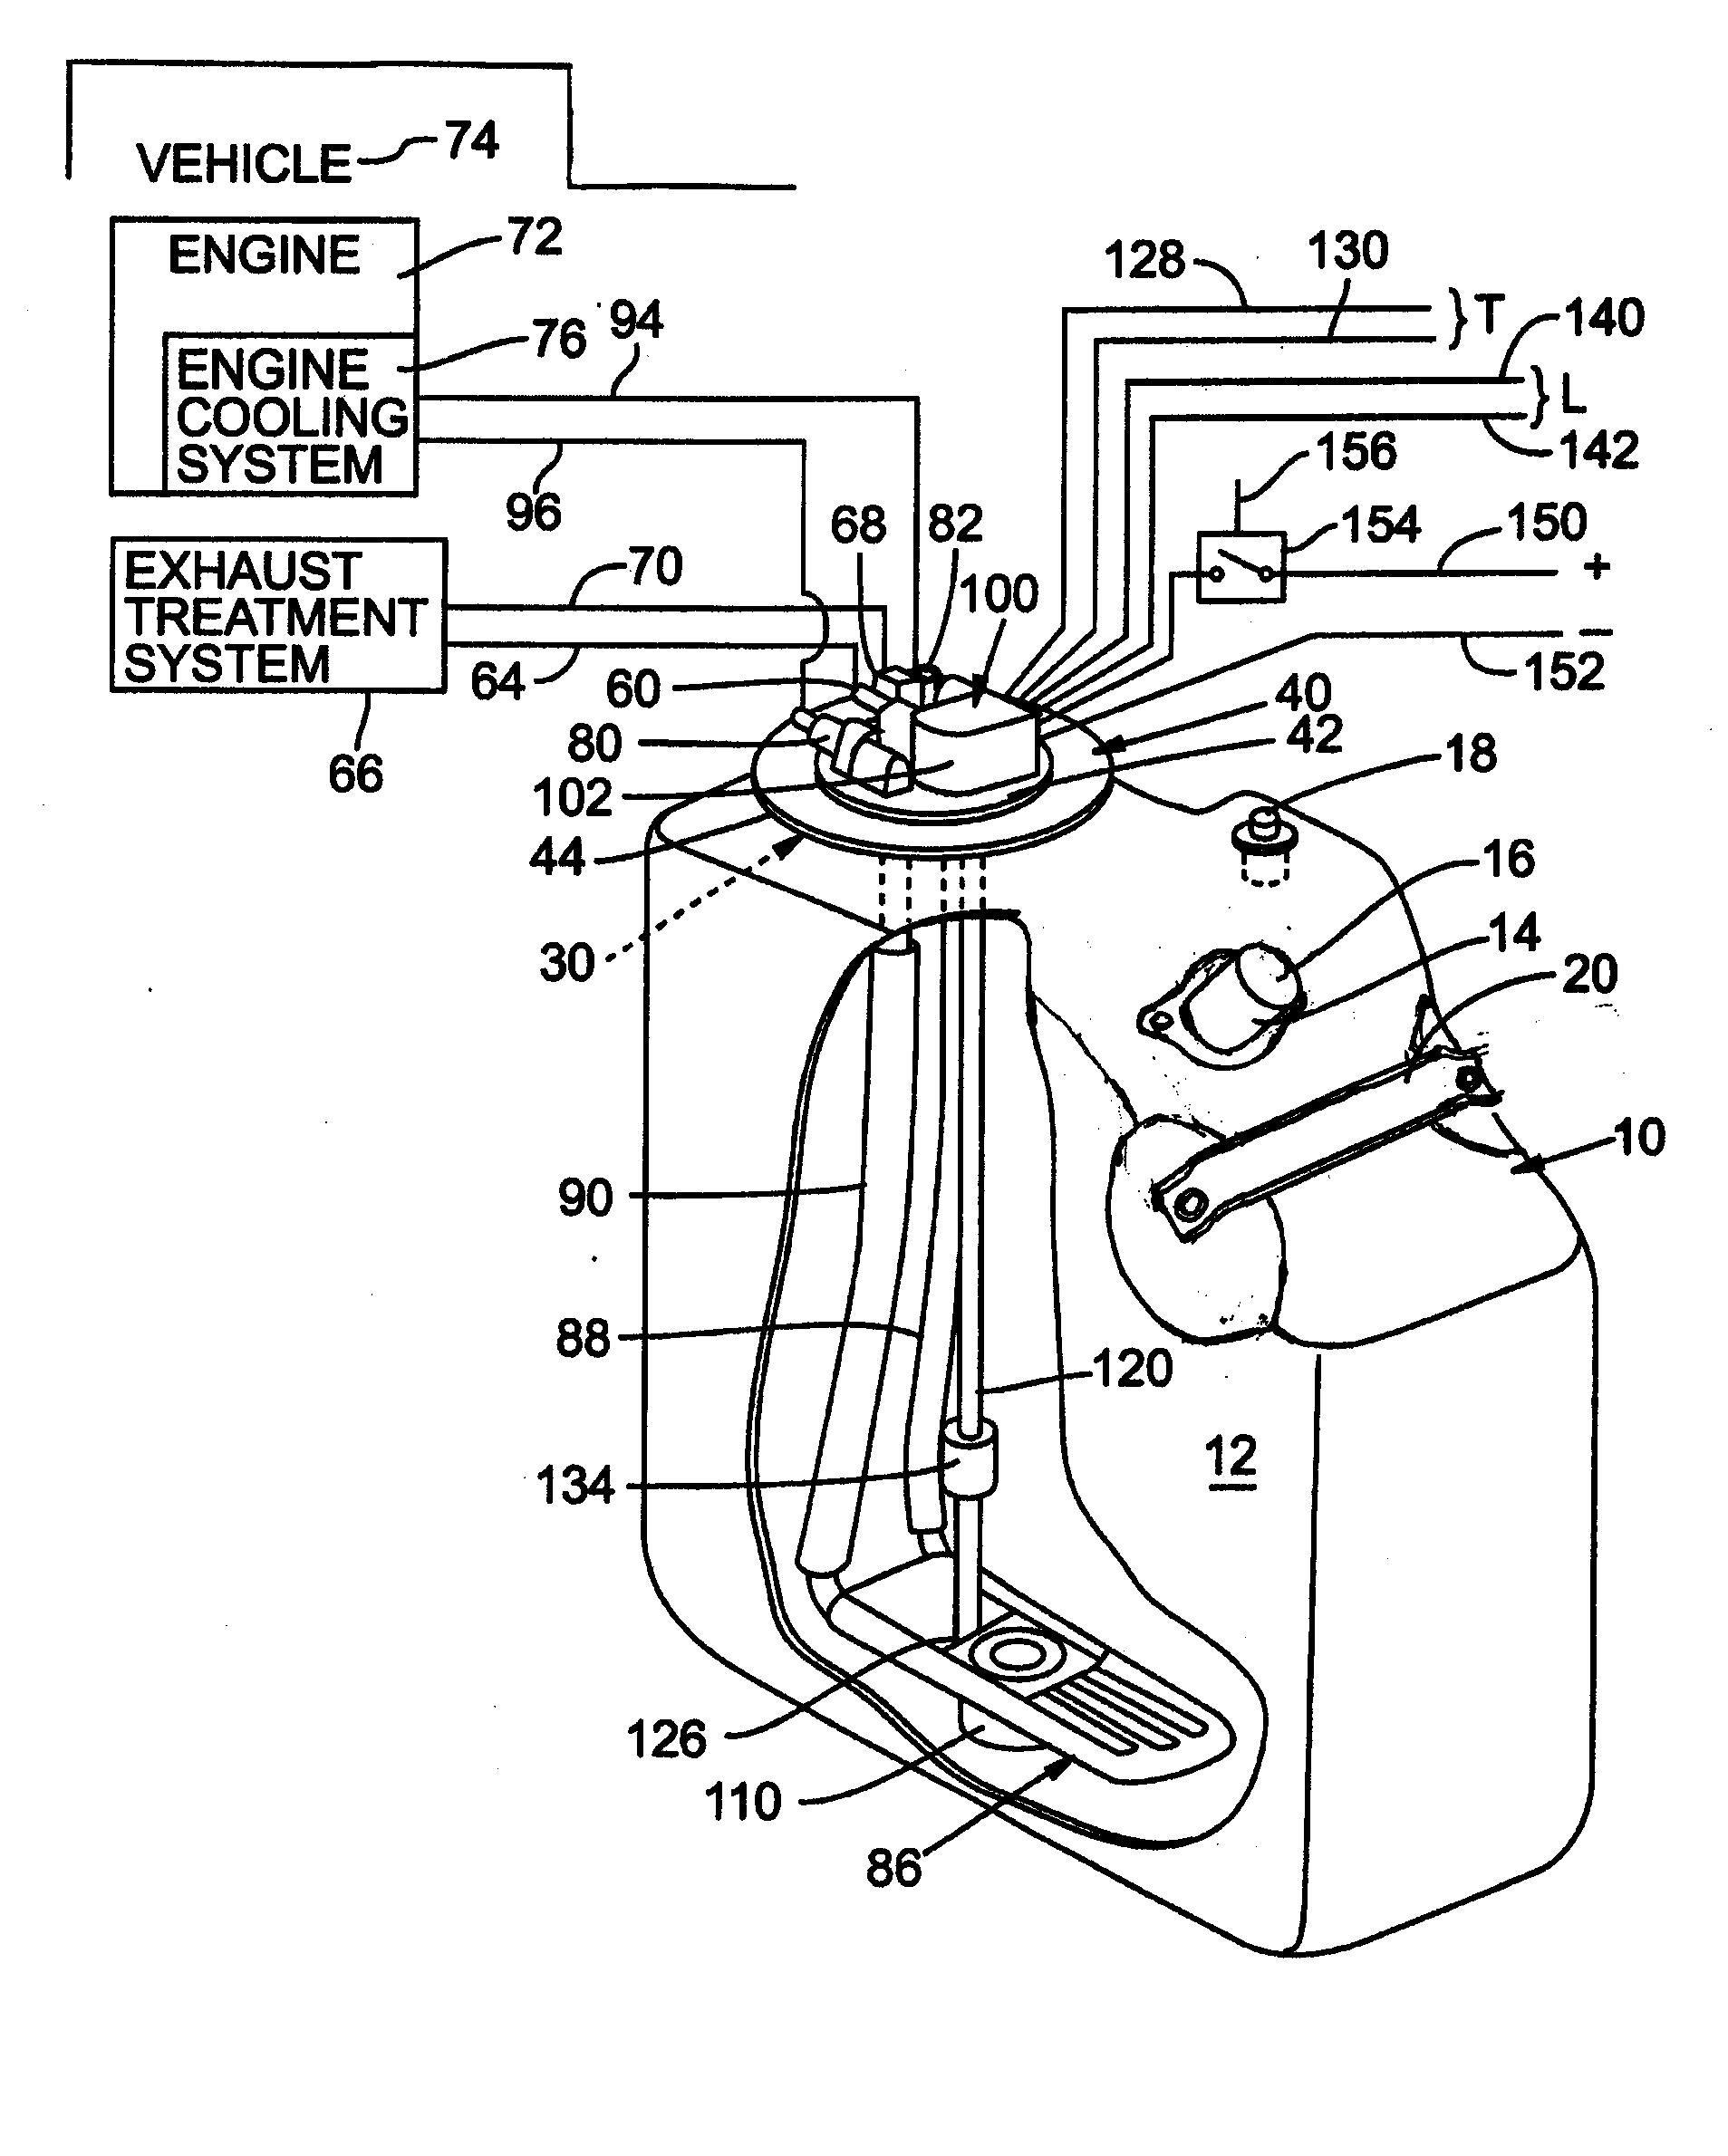 2013 freightliner radio wiring diagram